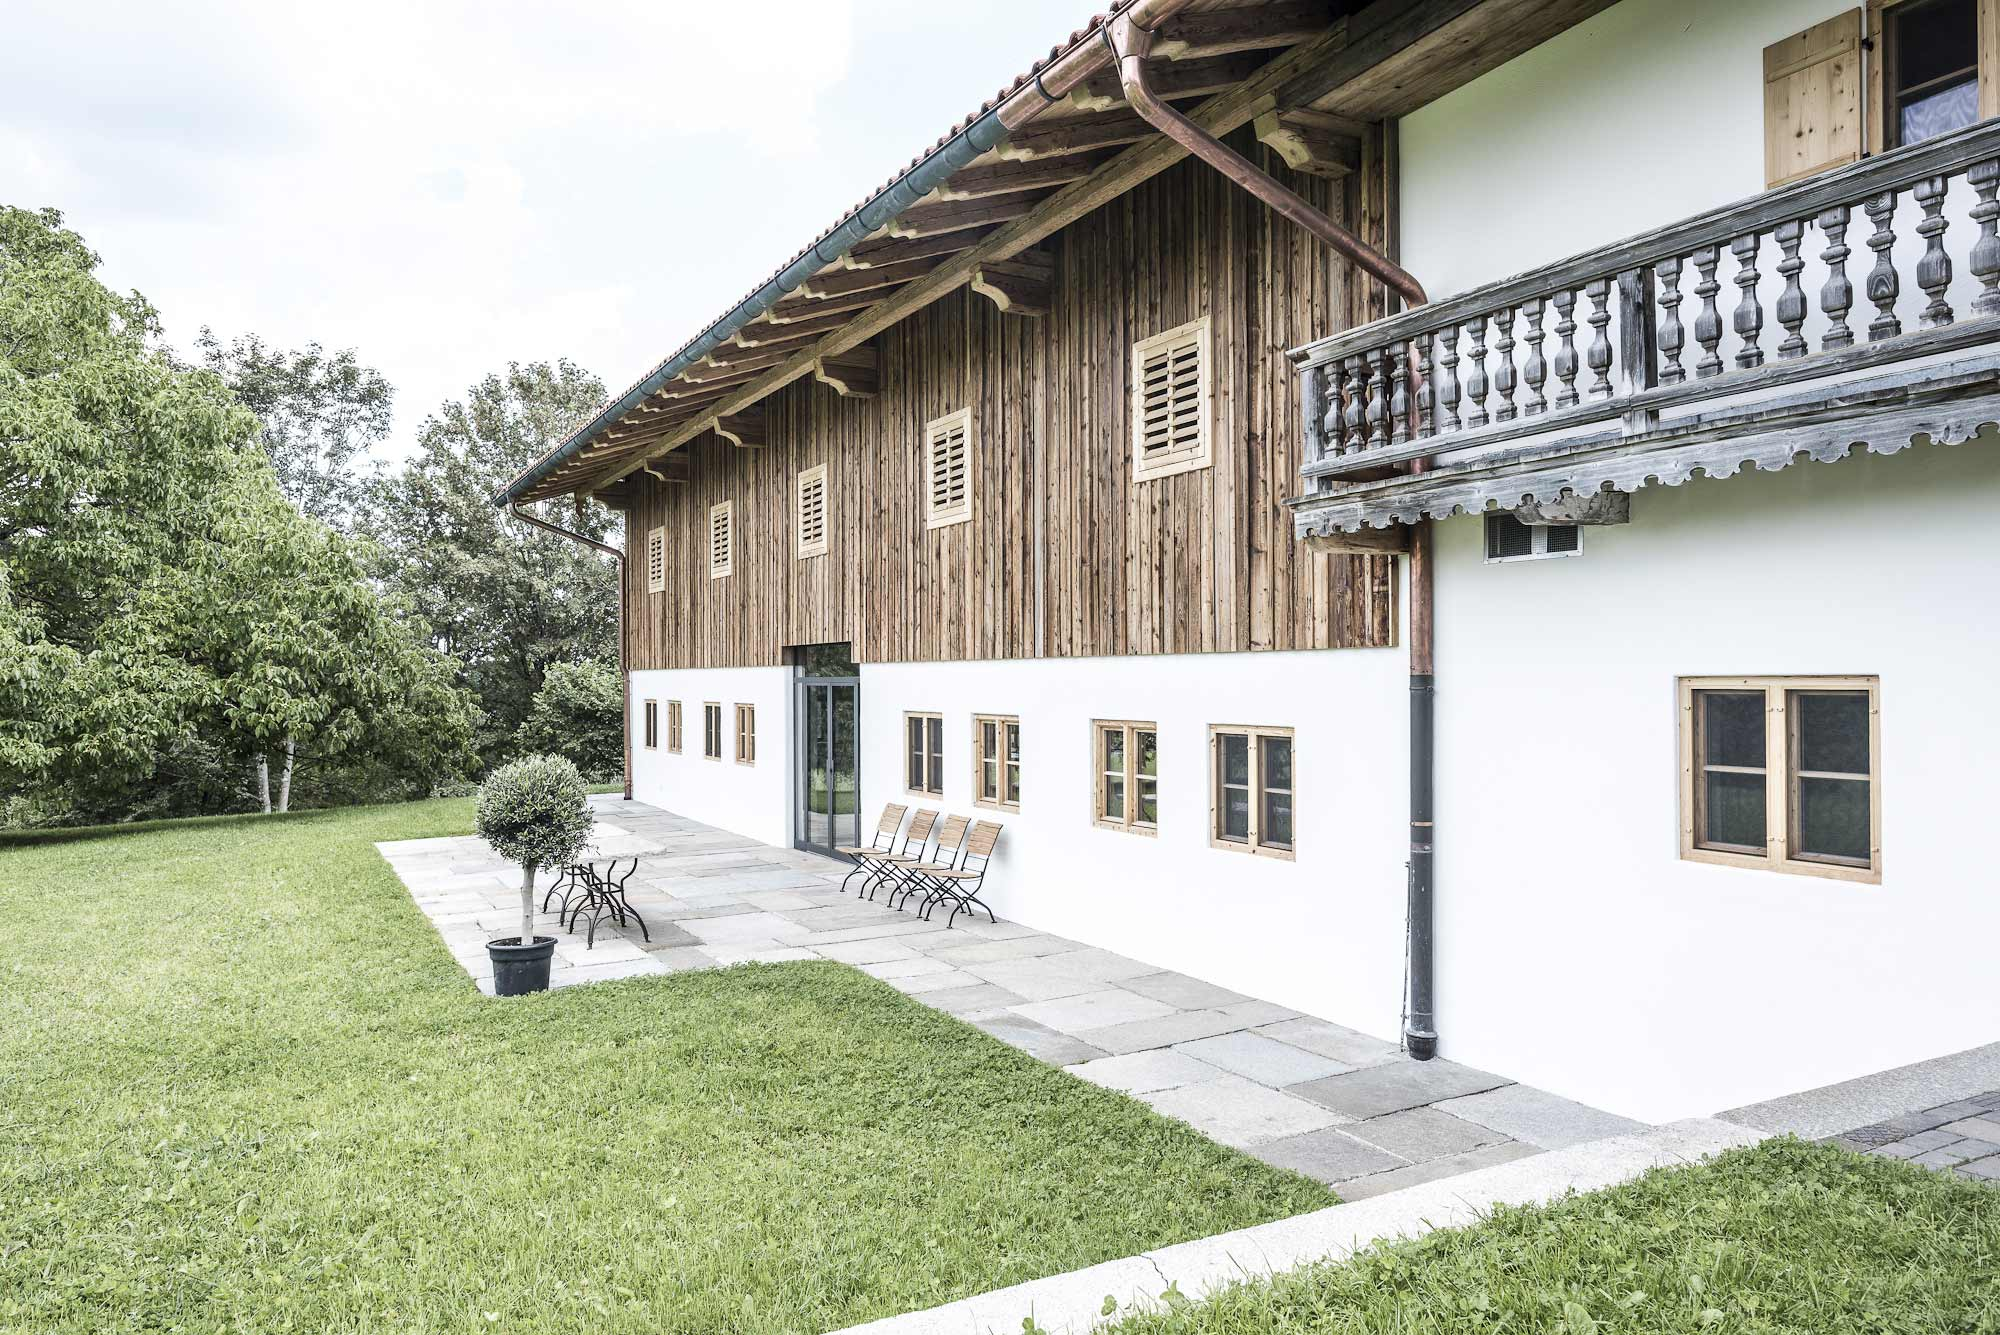 zimmerei-stoib-holzbau-sanierung-hof-umbau-altholz-innenausbau-festsaal-27.jpg